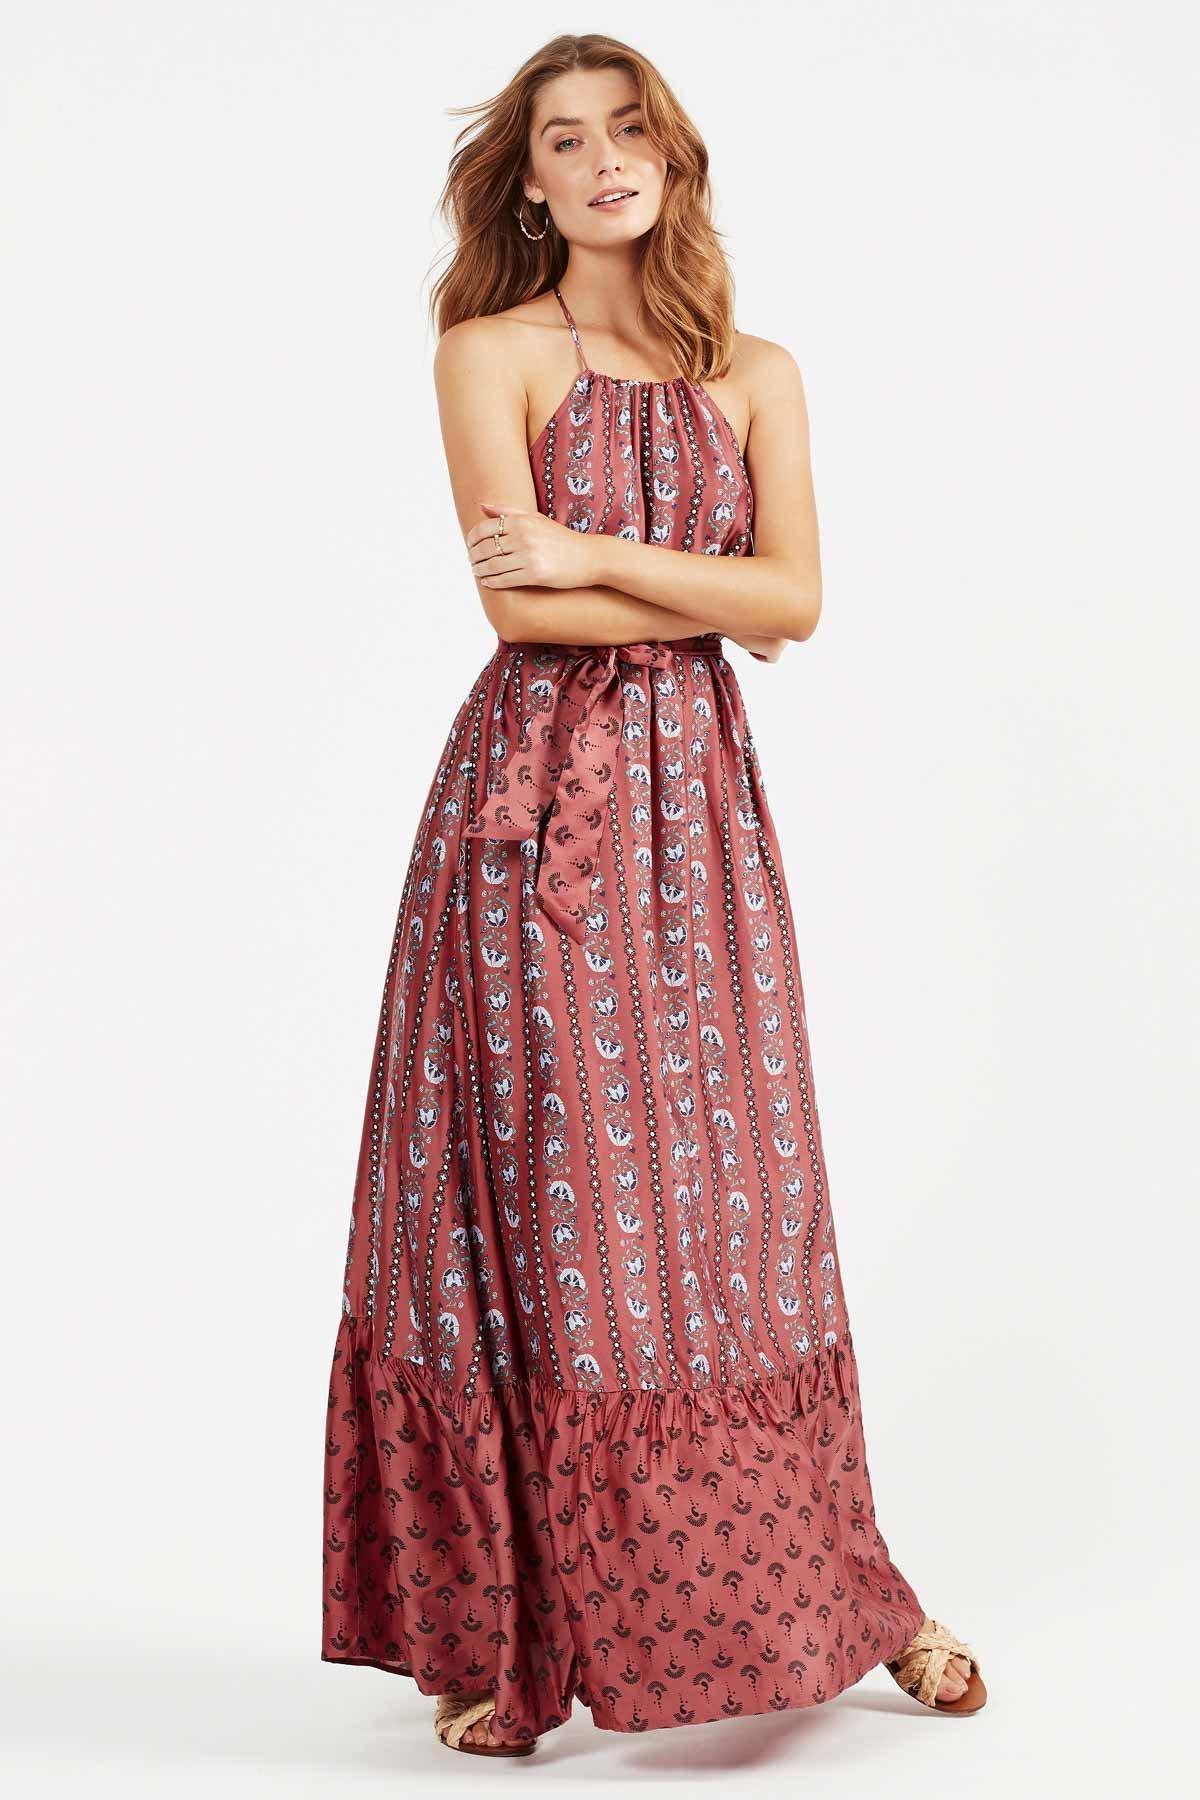 Image of Sunil Maxi Dress - Rose